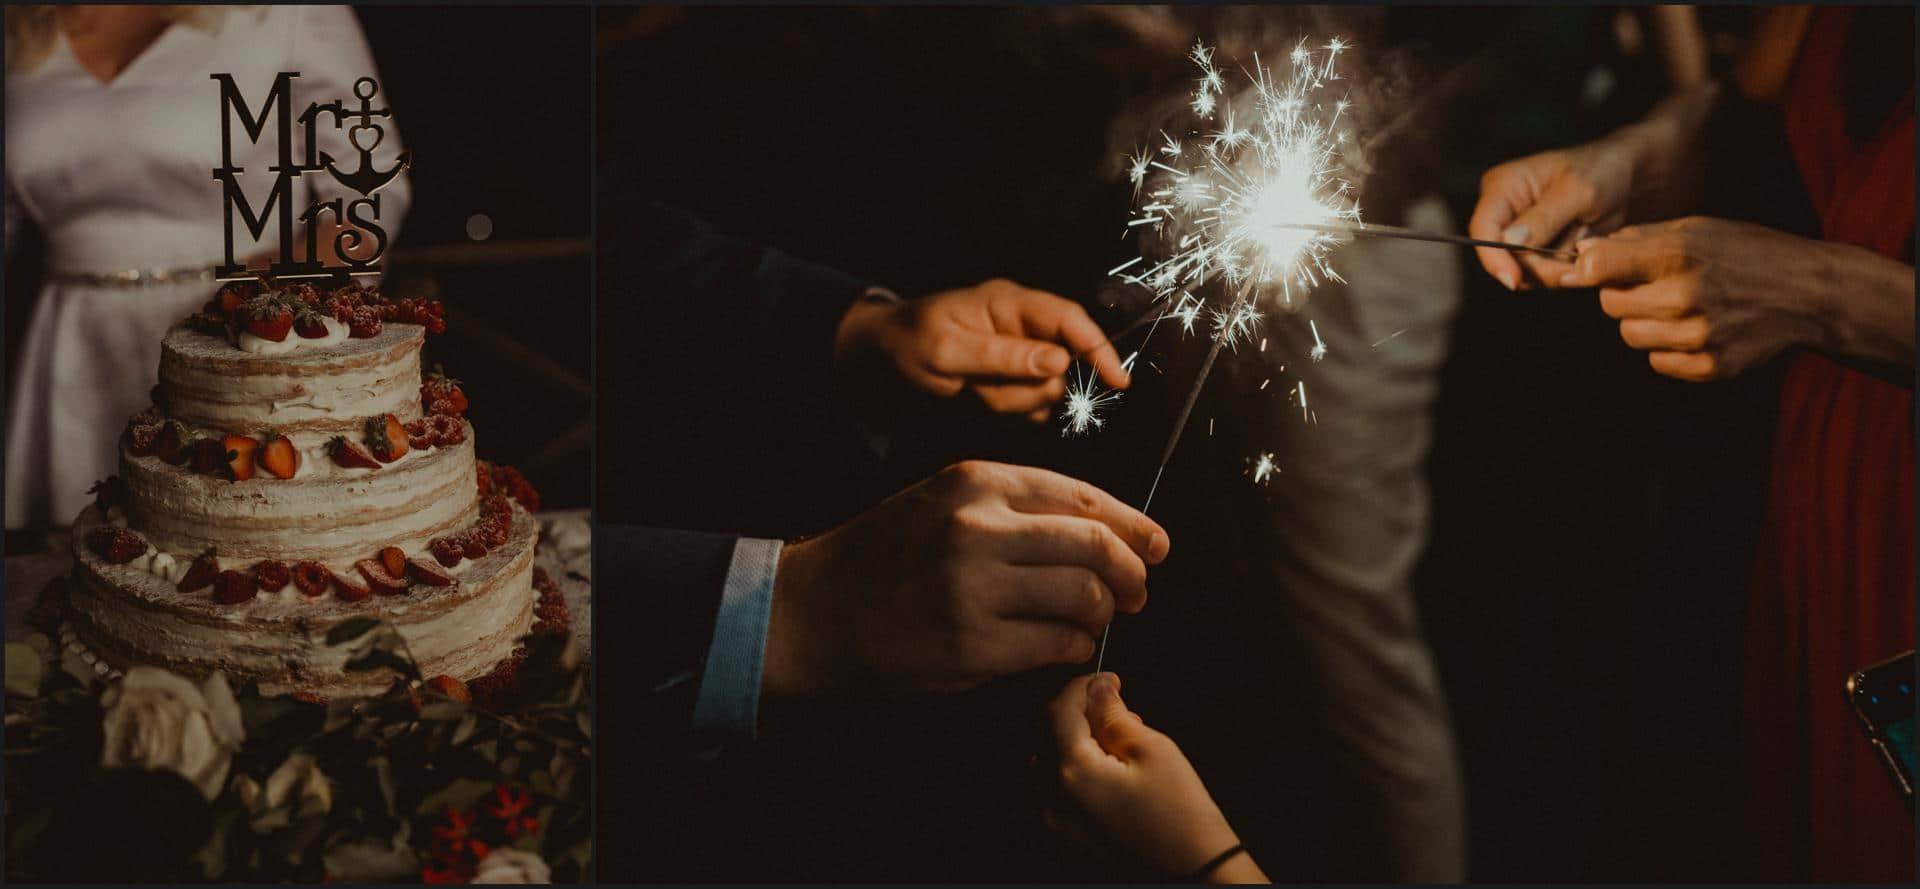 borgo di tragliata, wedding, rome, wedding in rome, wedding cake, wedding in italy